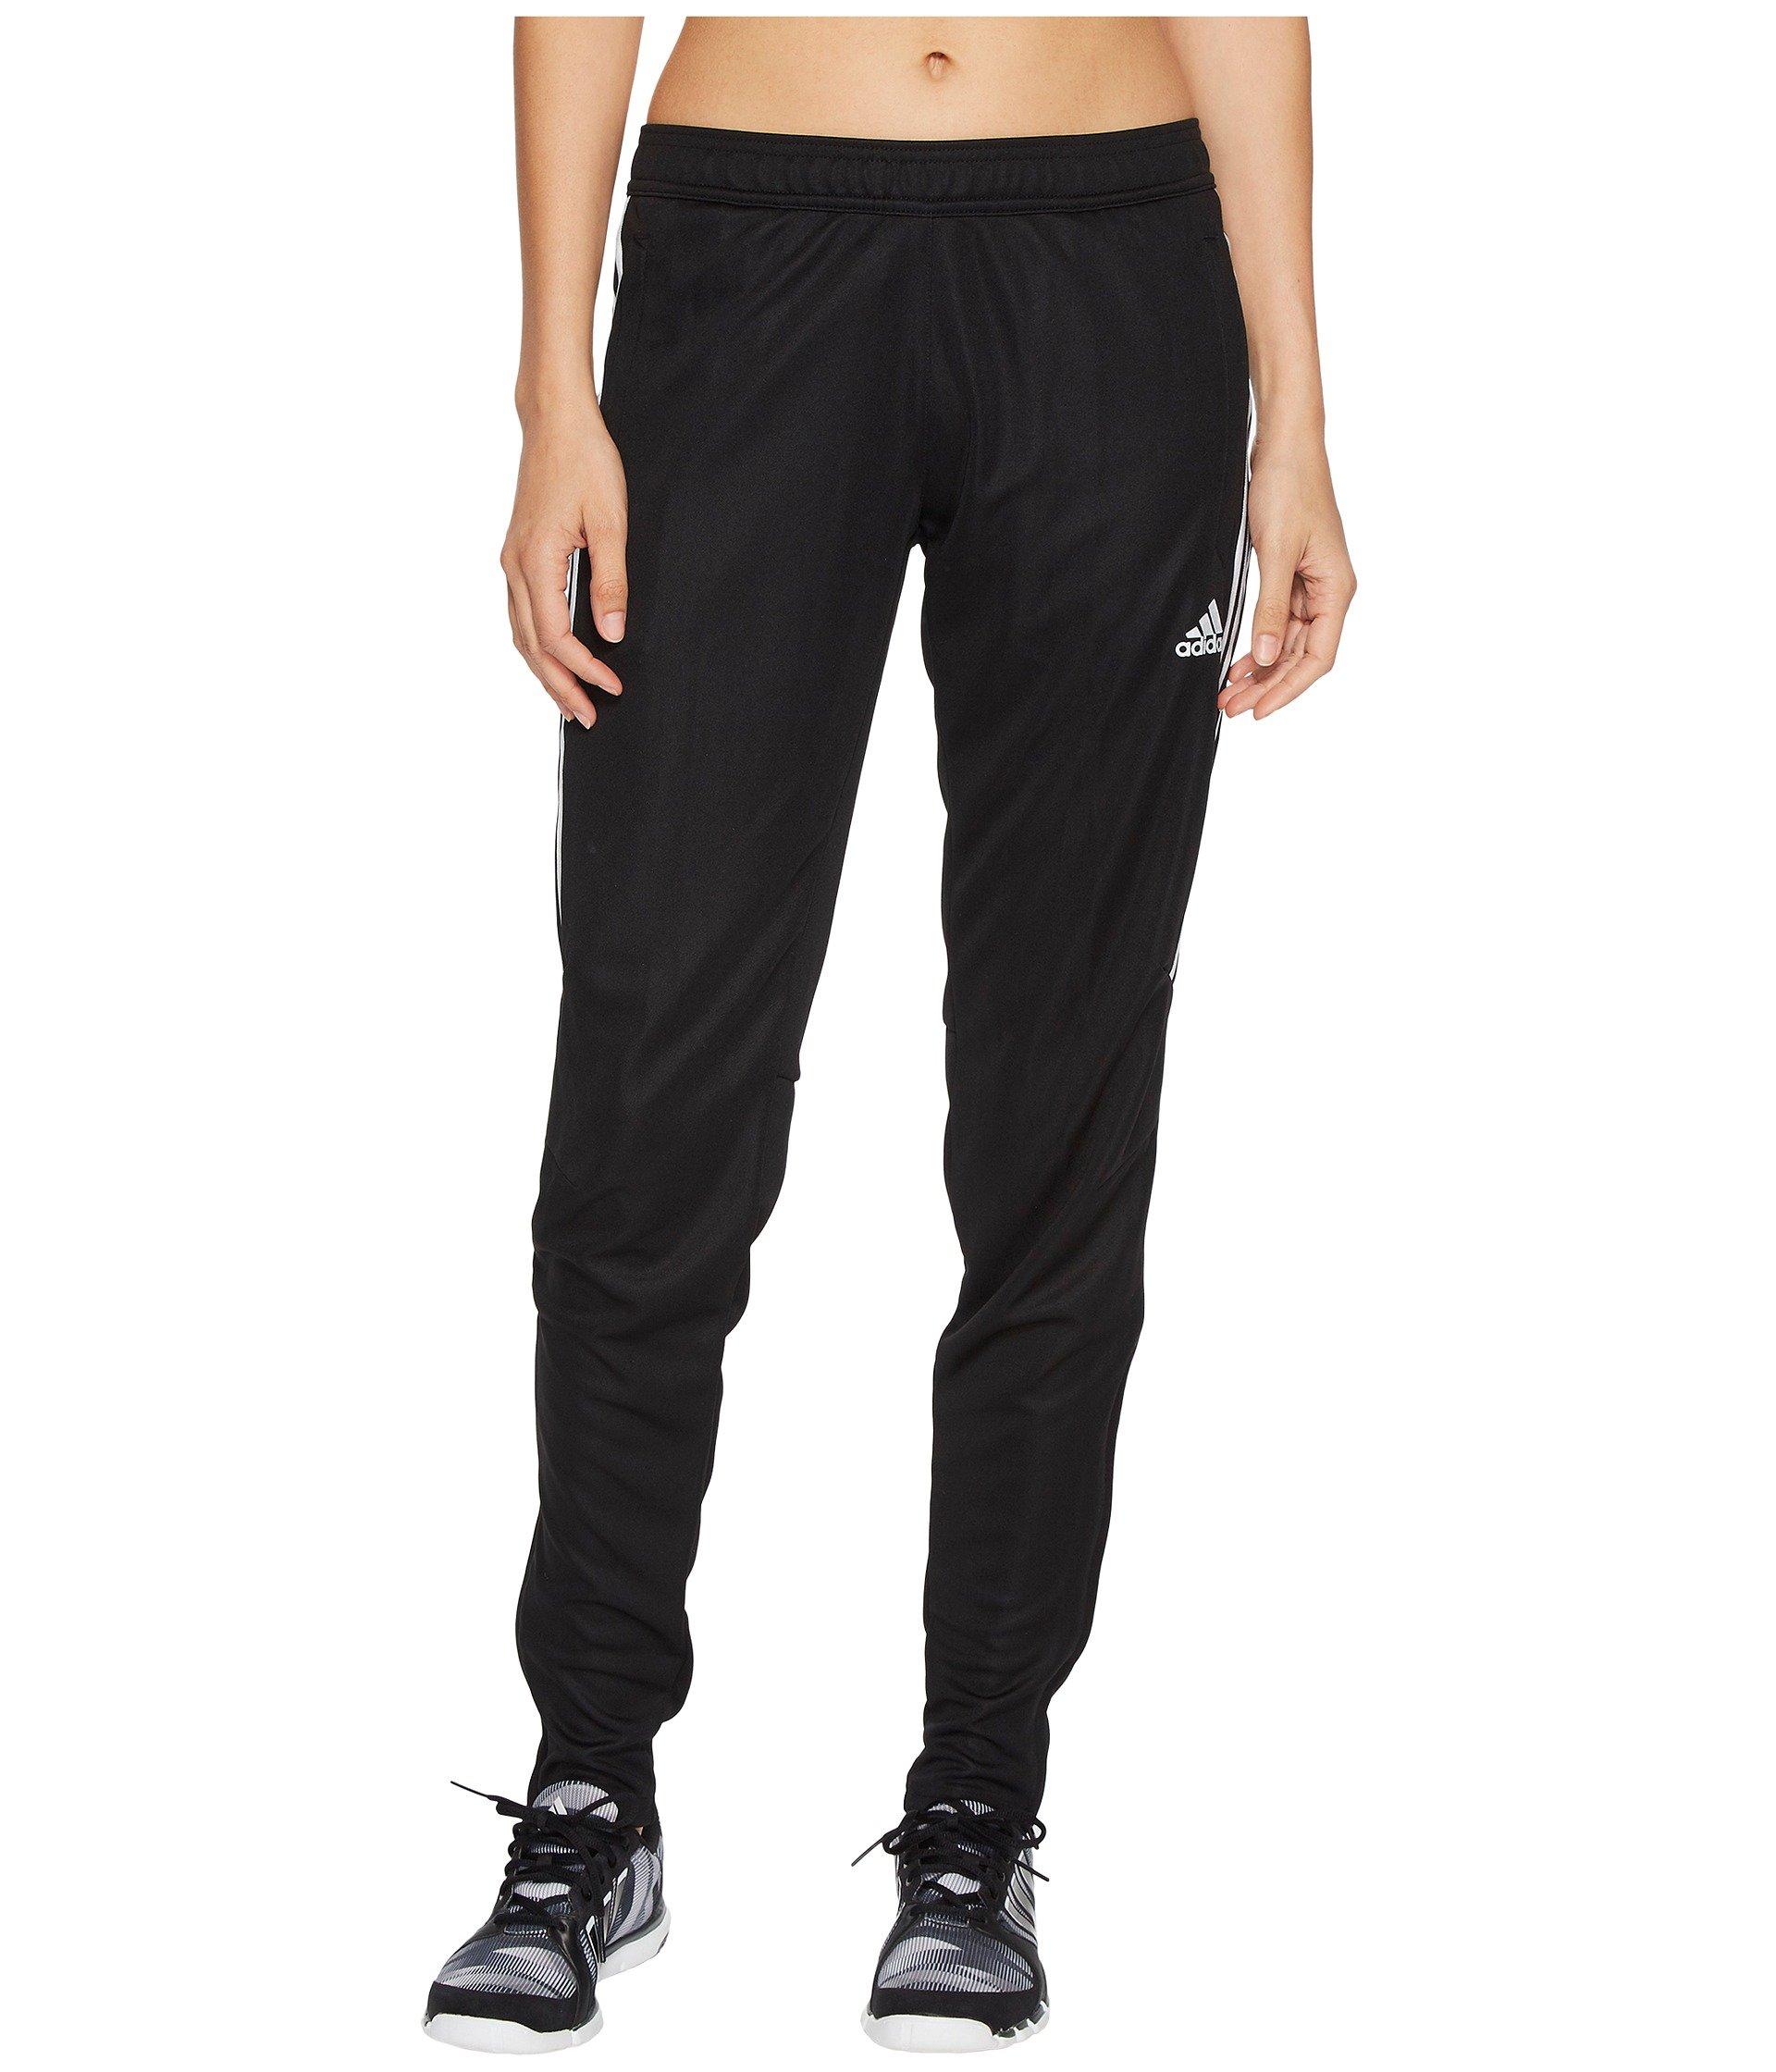 adidas Tiro '17 Pants Black/Silver Reflective 2XS by adidas